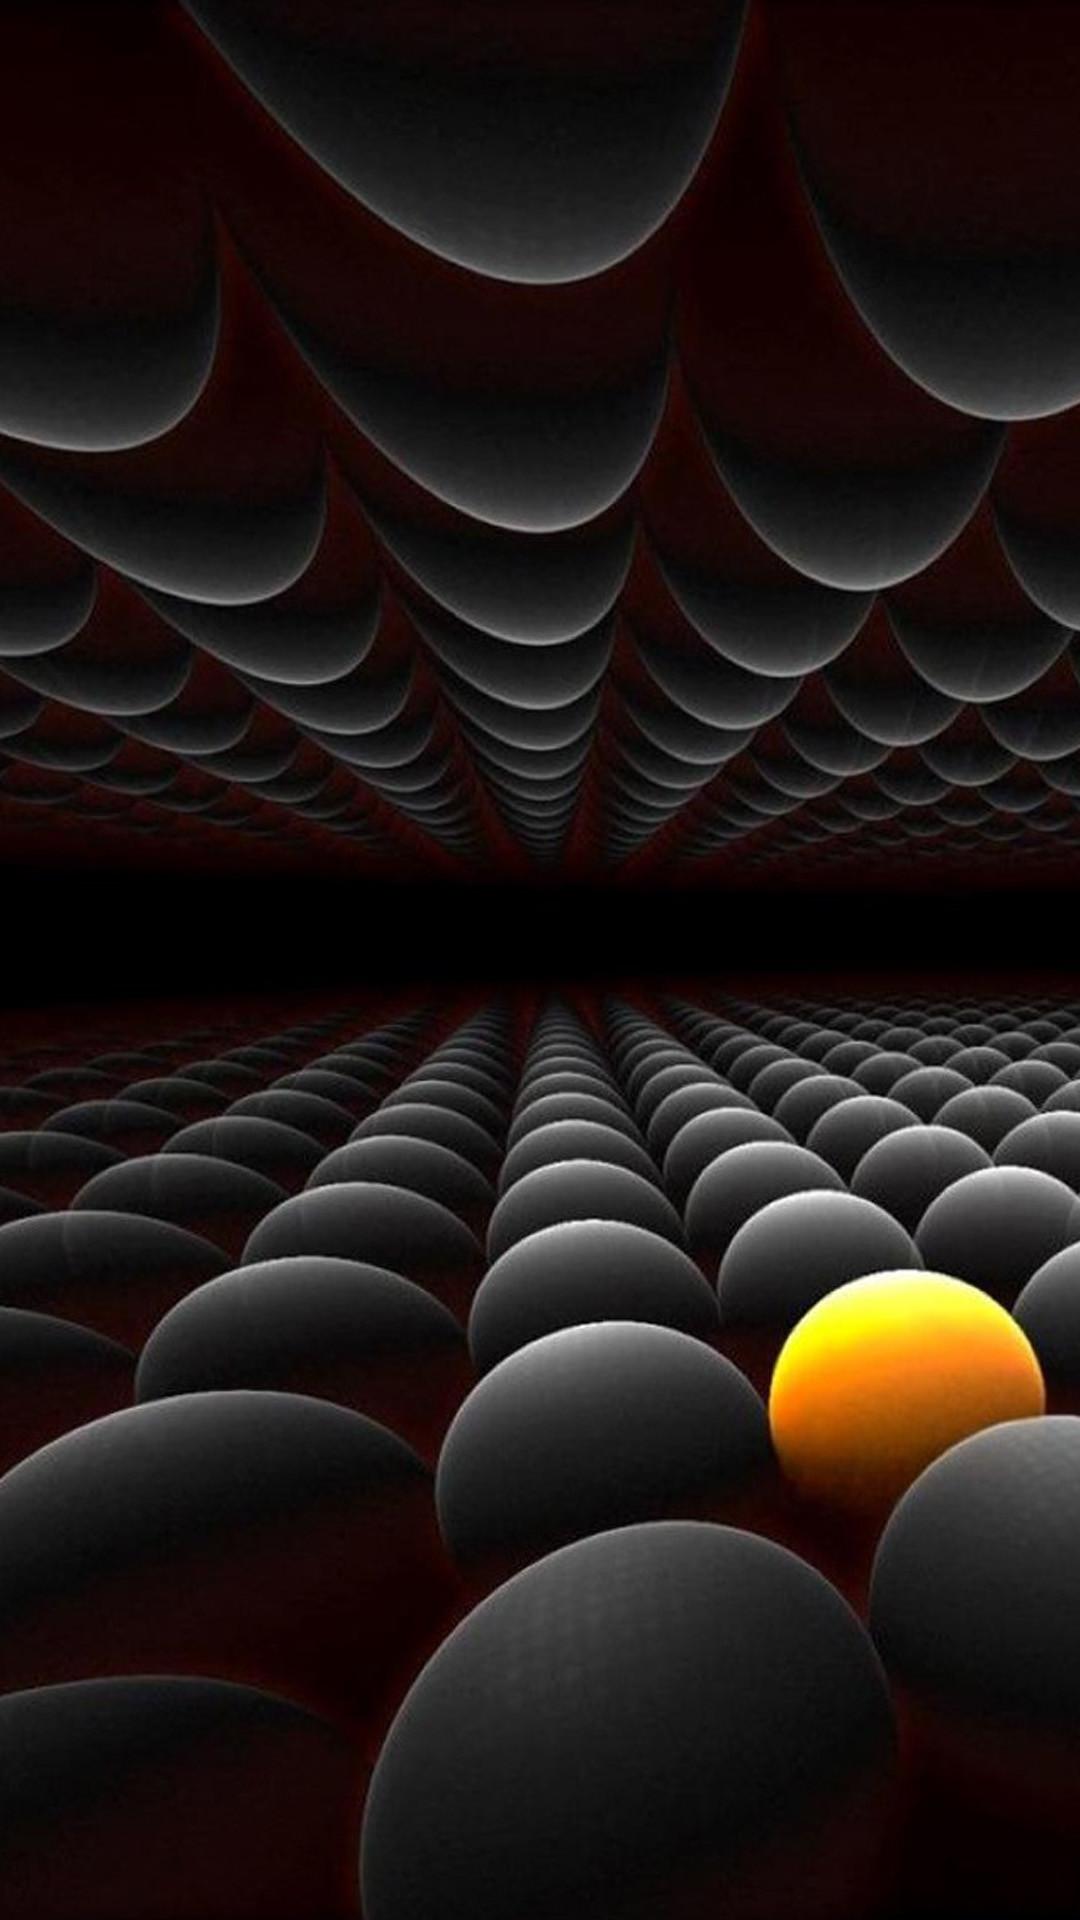 Infinite Balls Array Render iPhone 6 Plus HD Wallpaper